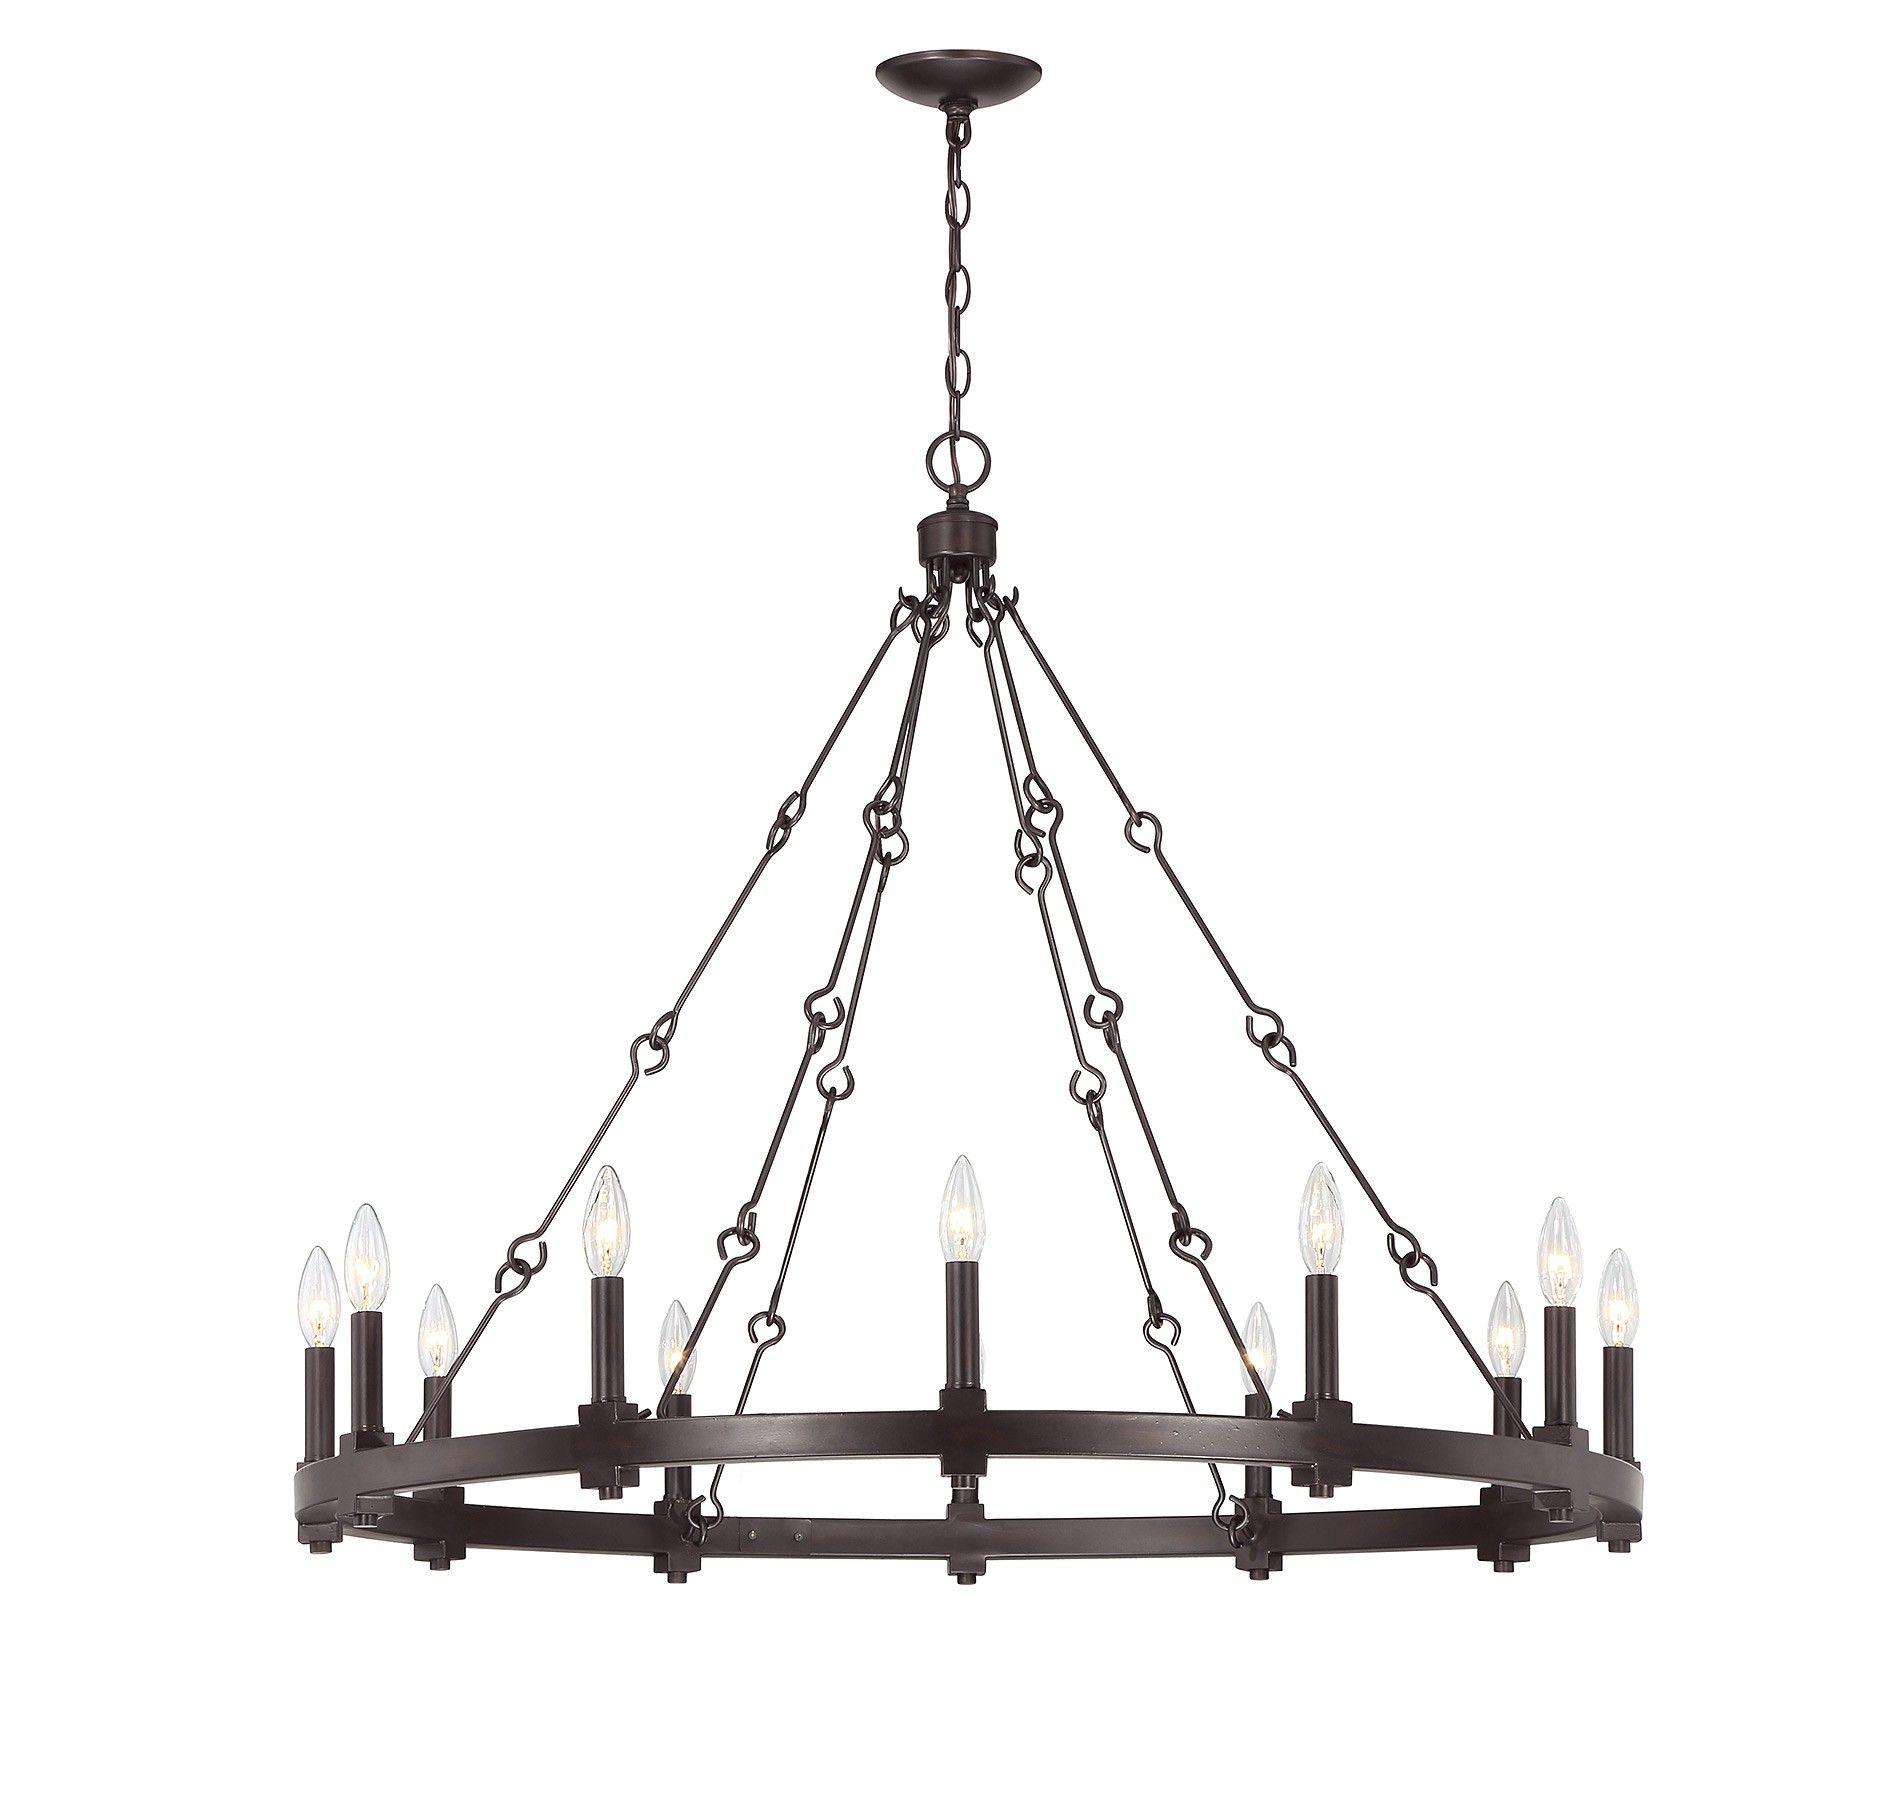 Savoy house adria 12 light chandelier in english bronze bronze savoy house adria 12 light chandelier in english bronze arubaitofo Choice Image